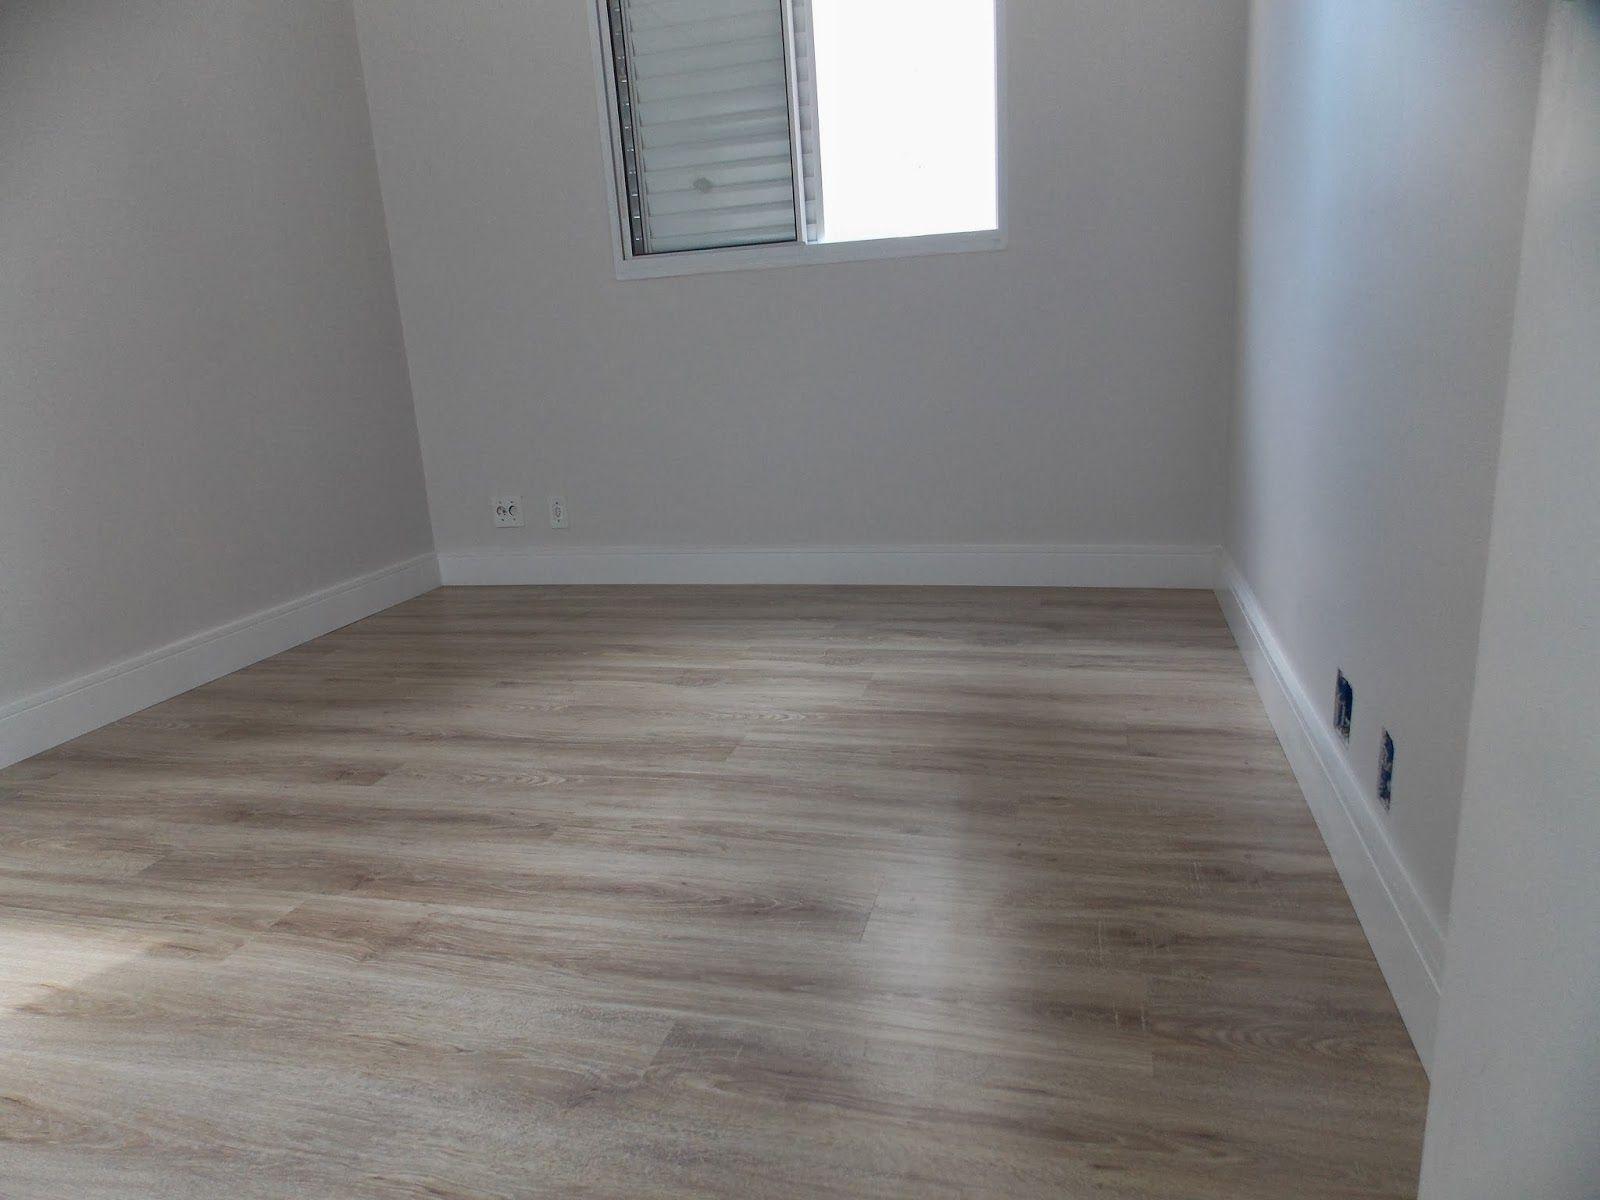 Loucos do 14!!: Nosso piso laminado!